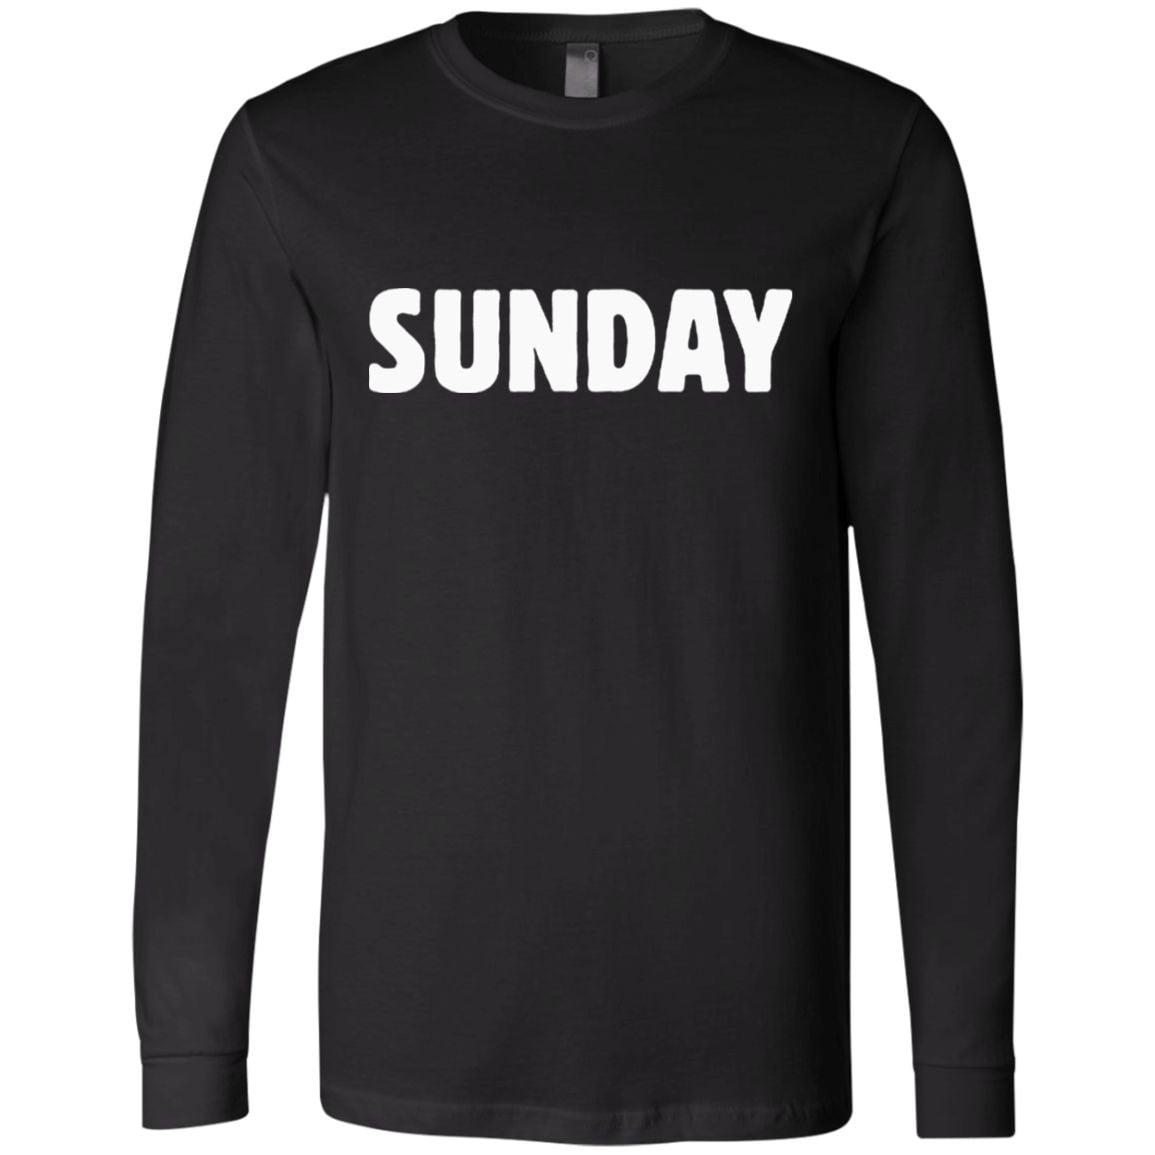 Sunday T Shirt